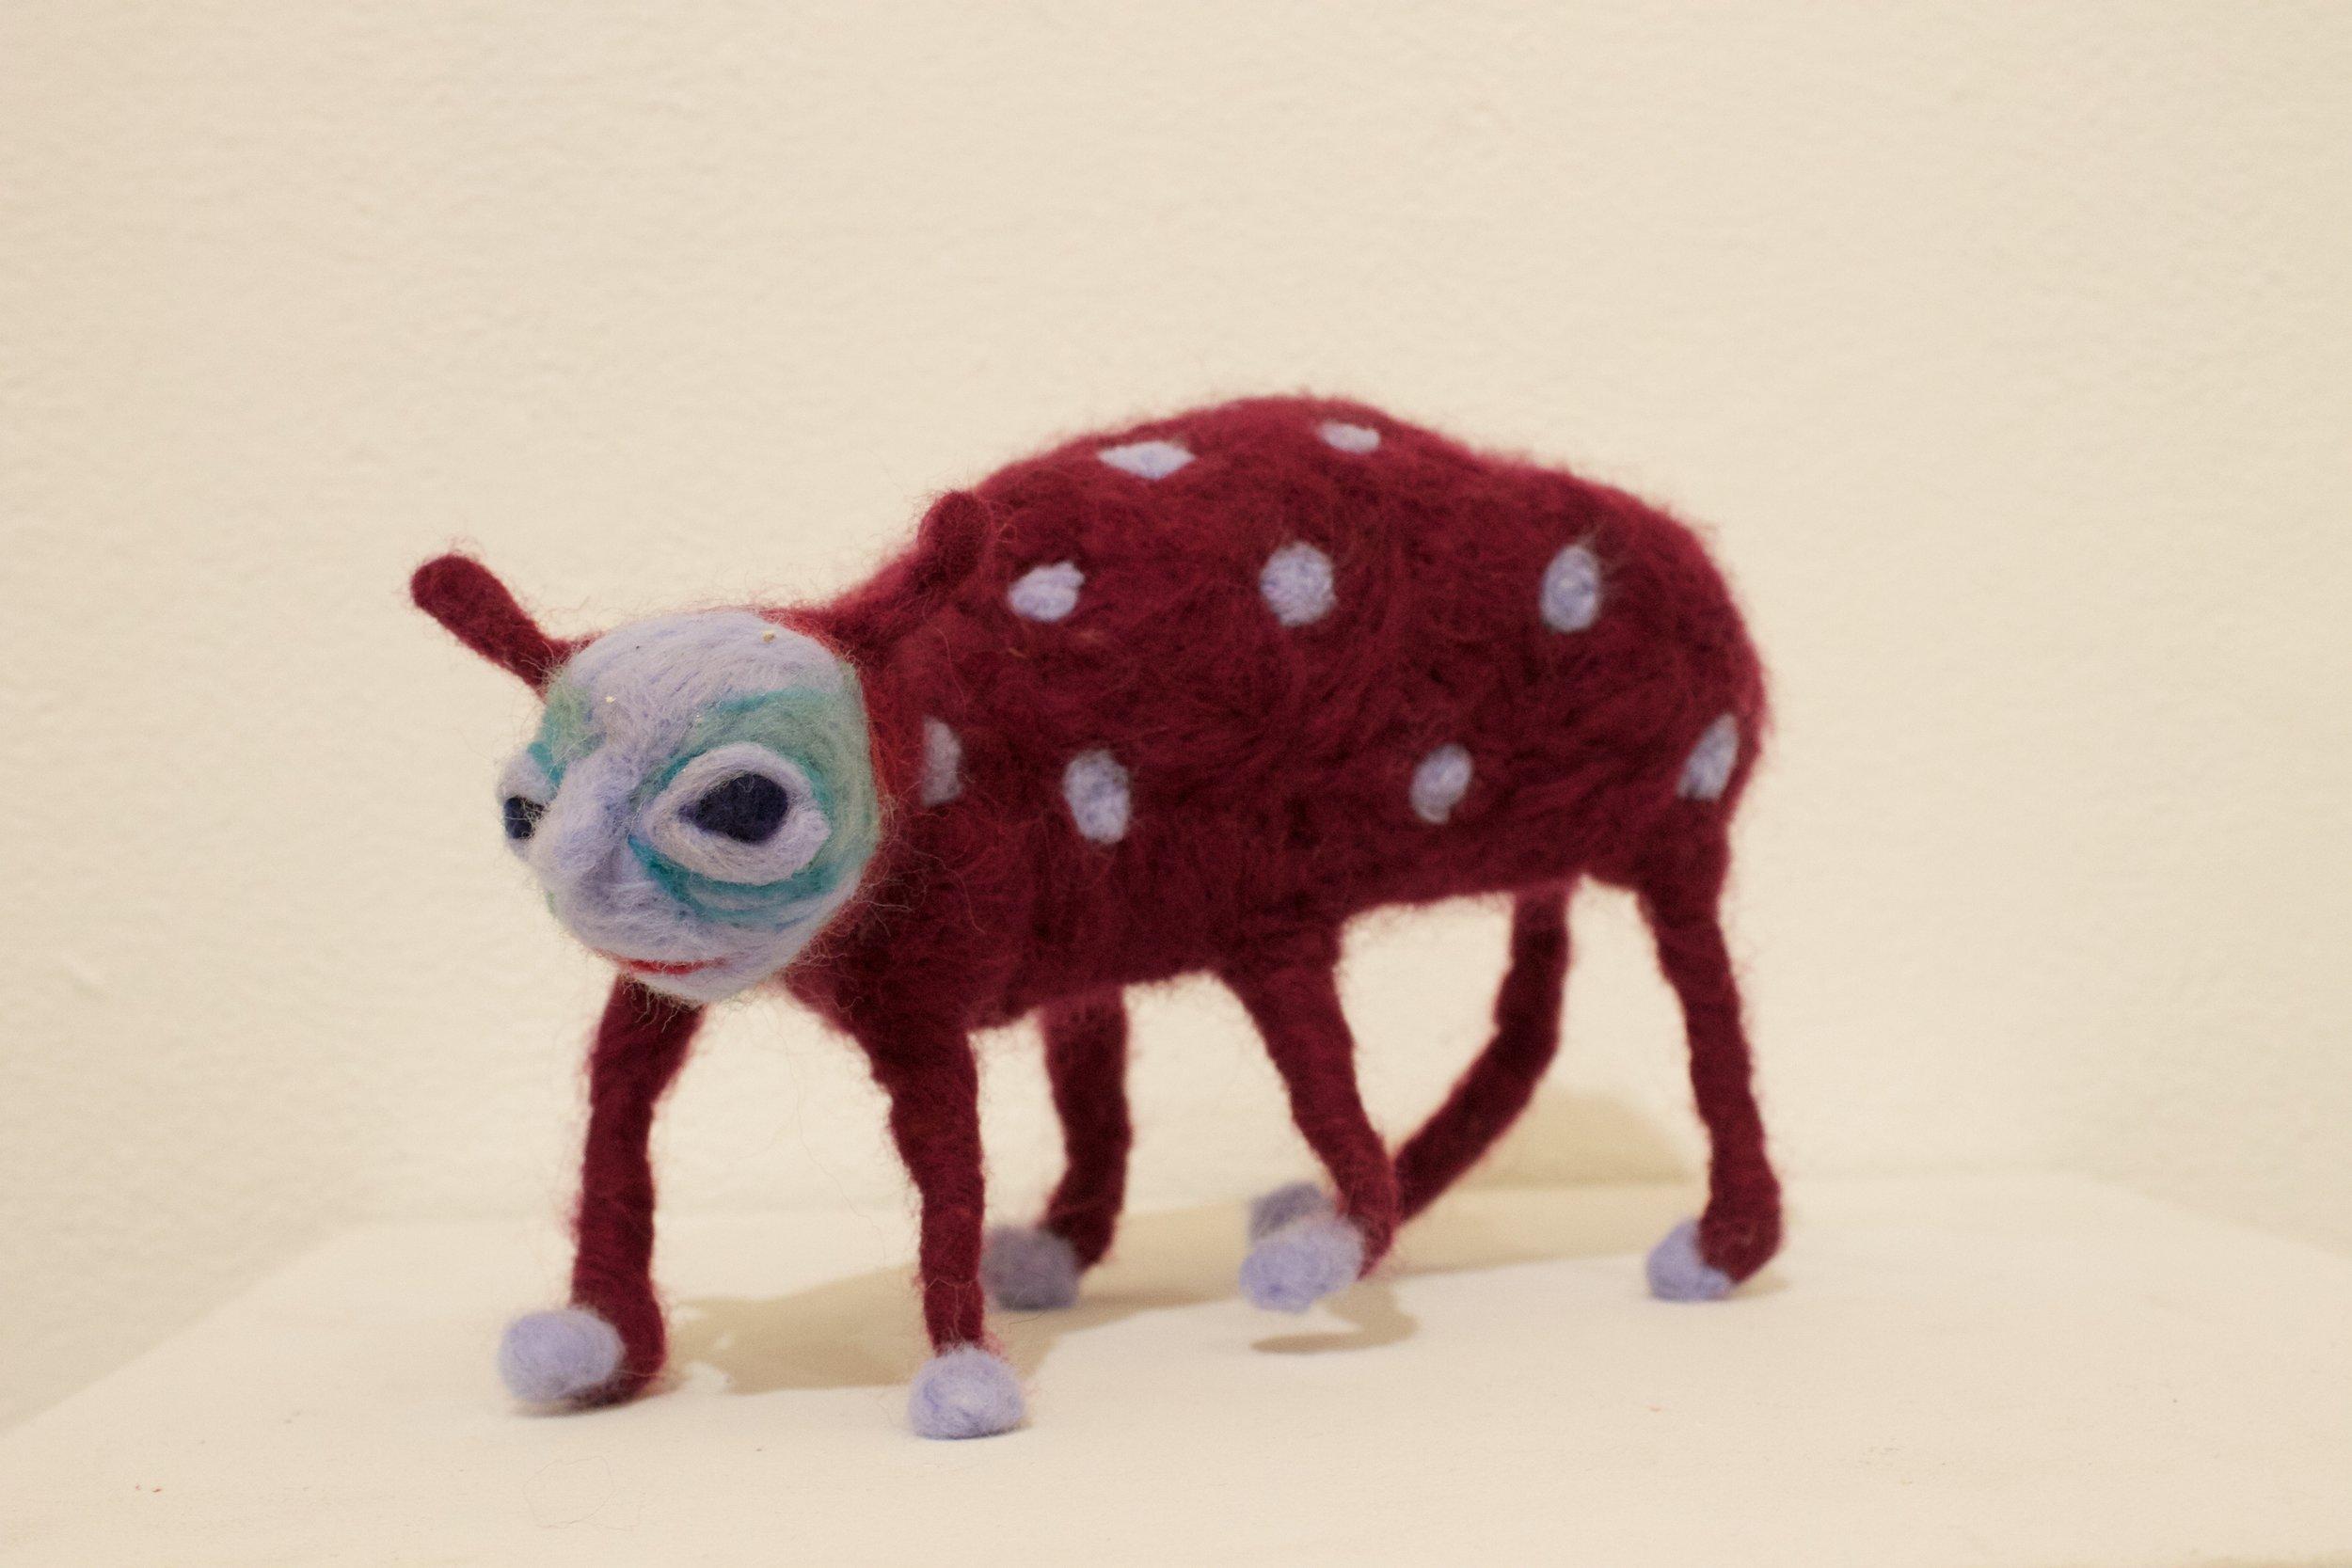 SIx Legged Susie (2019)  Wool roving, wire, polyfil